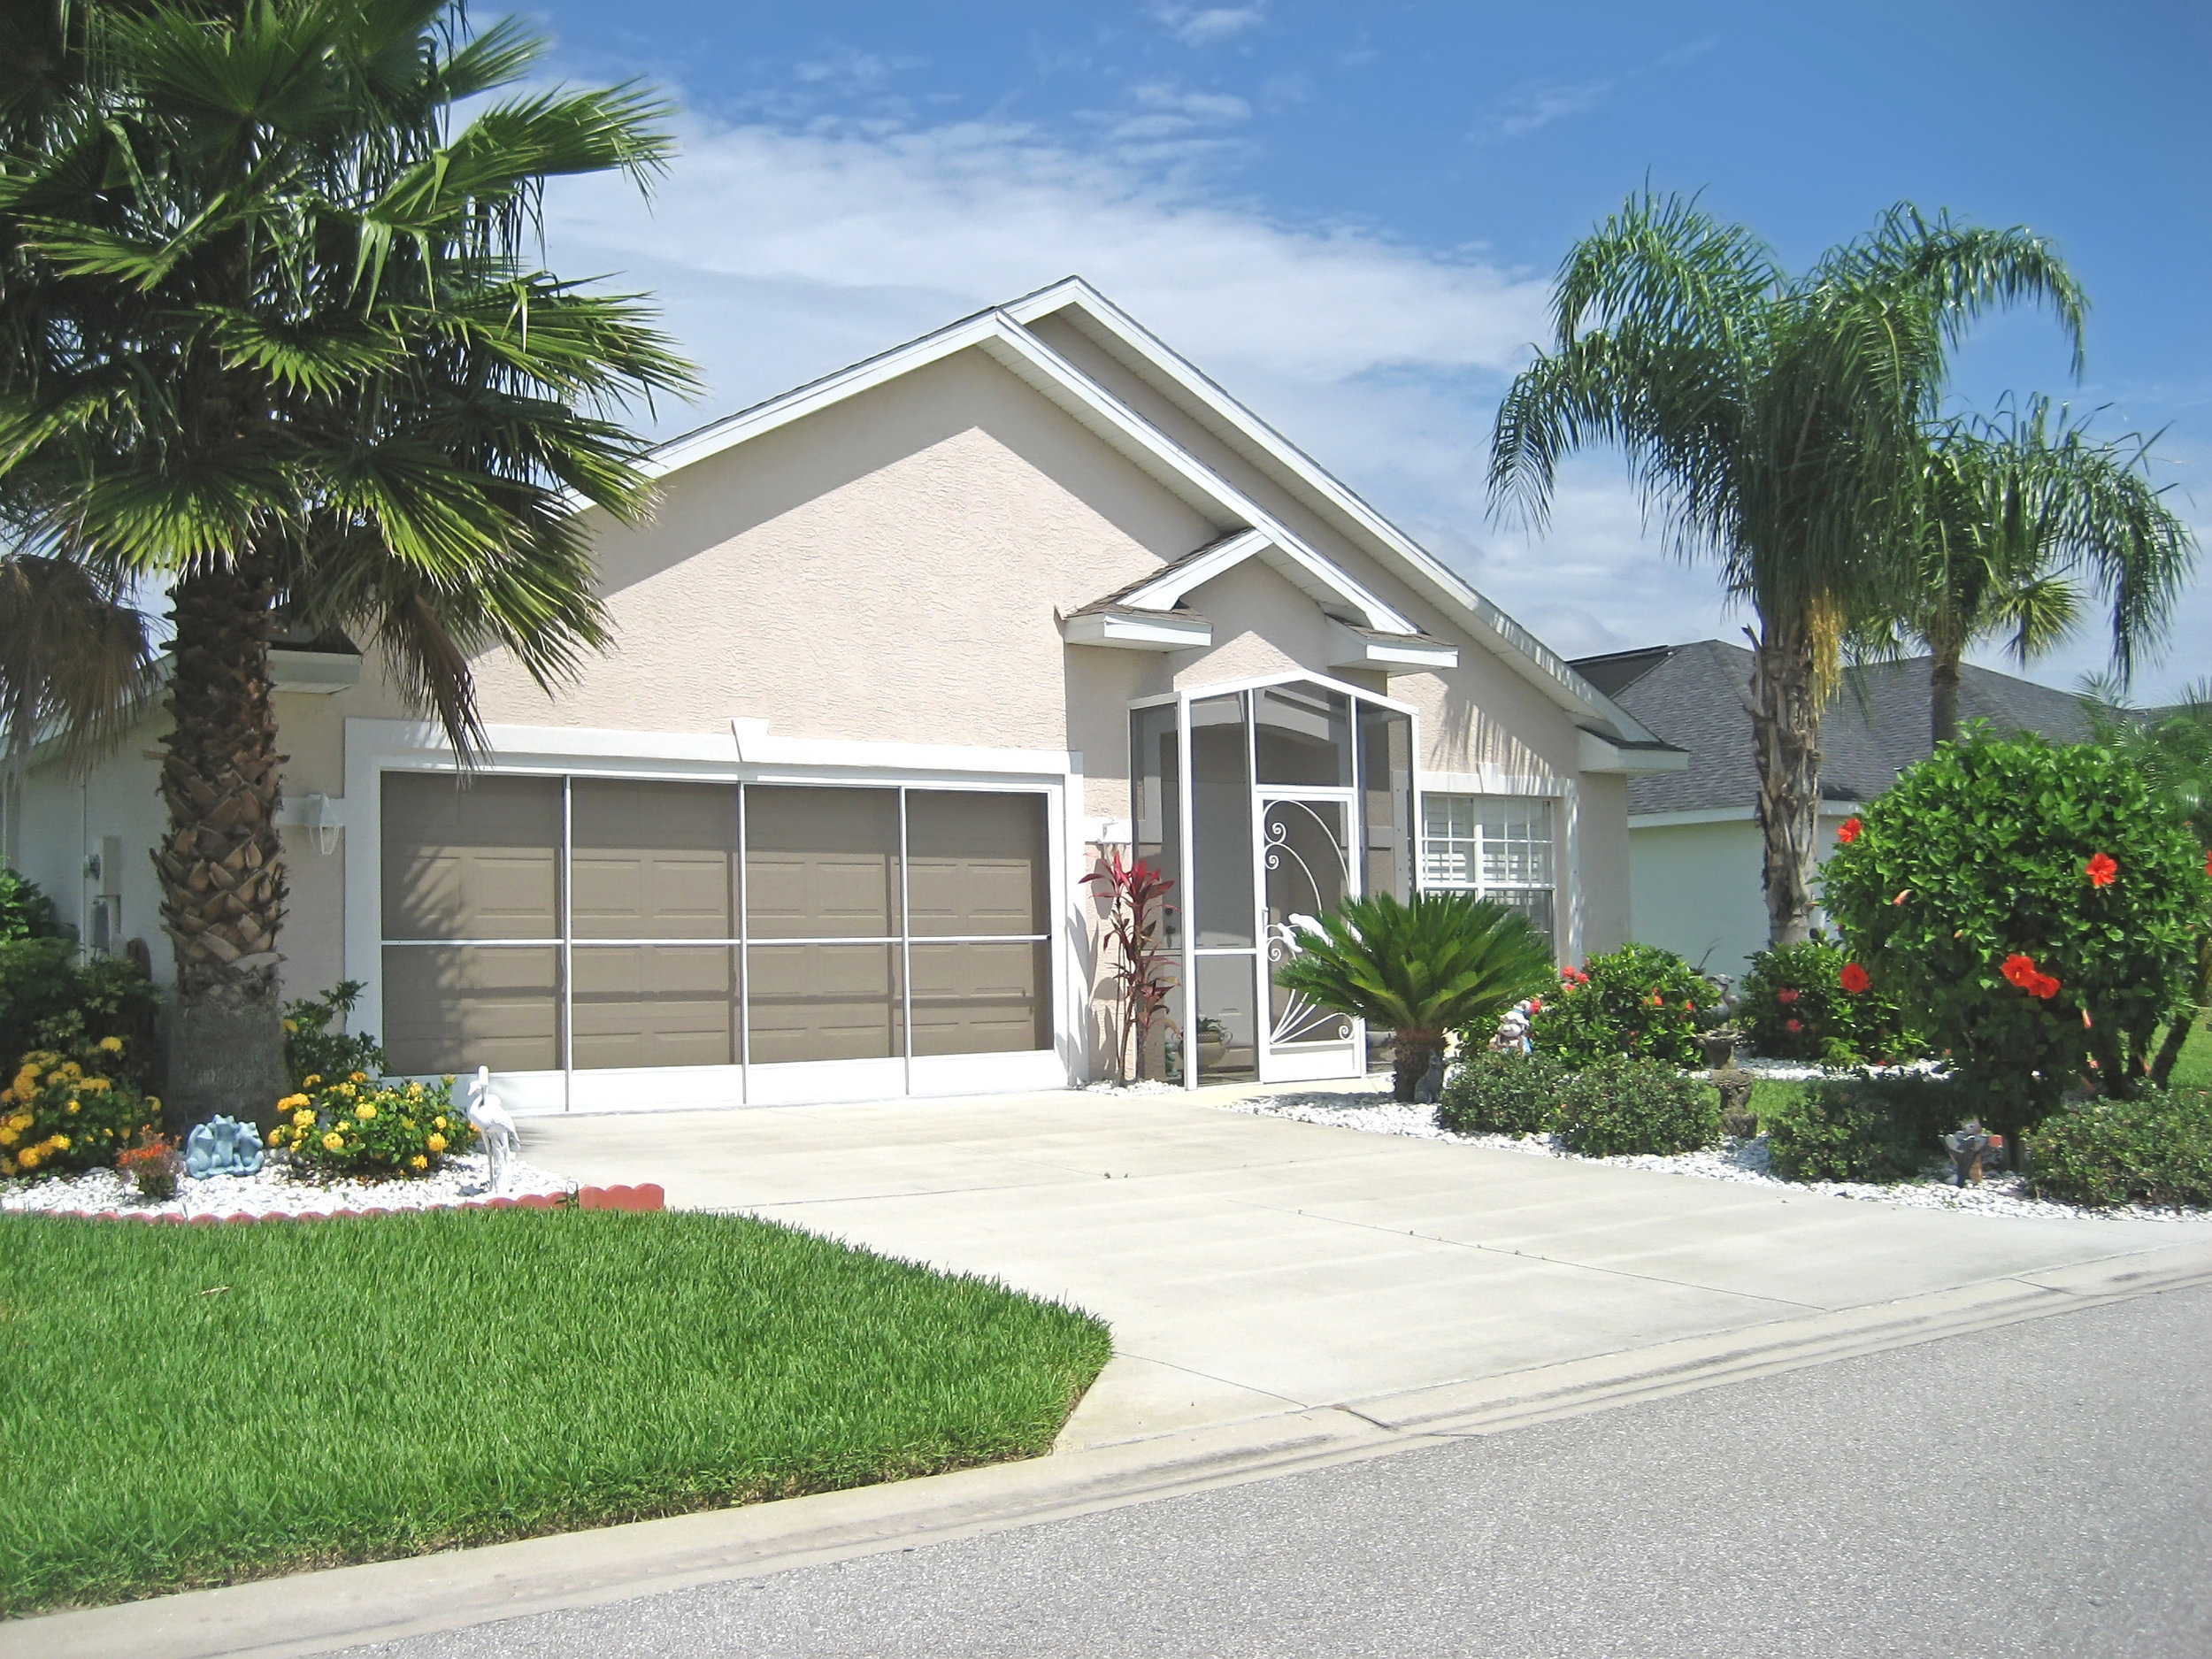 Joe-the-Home-Pro-Naples-Florida-Home-photo